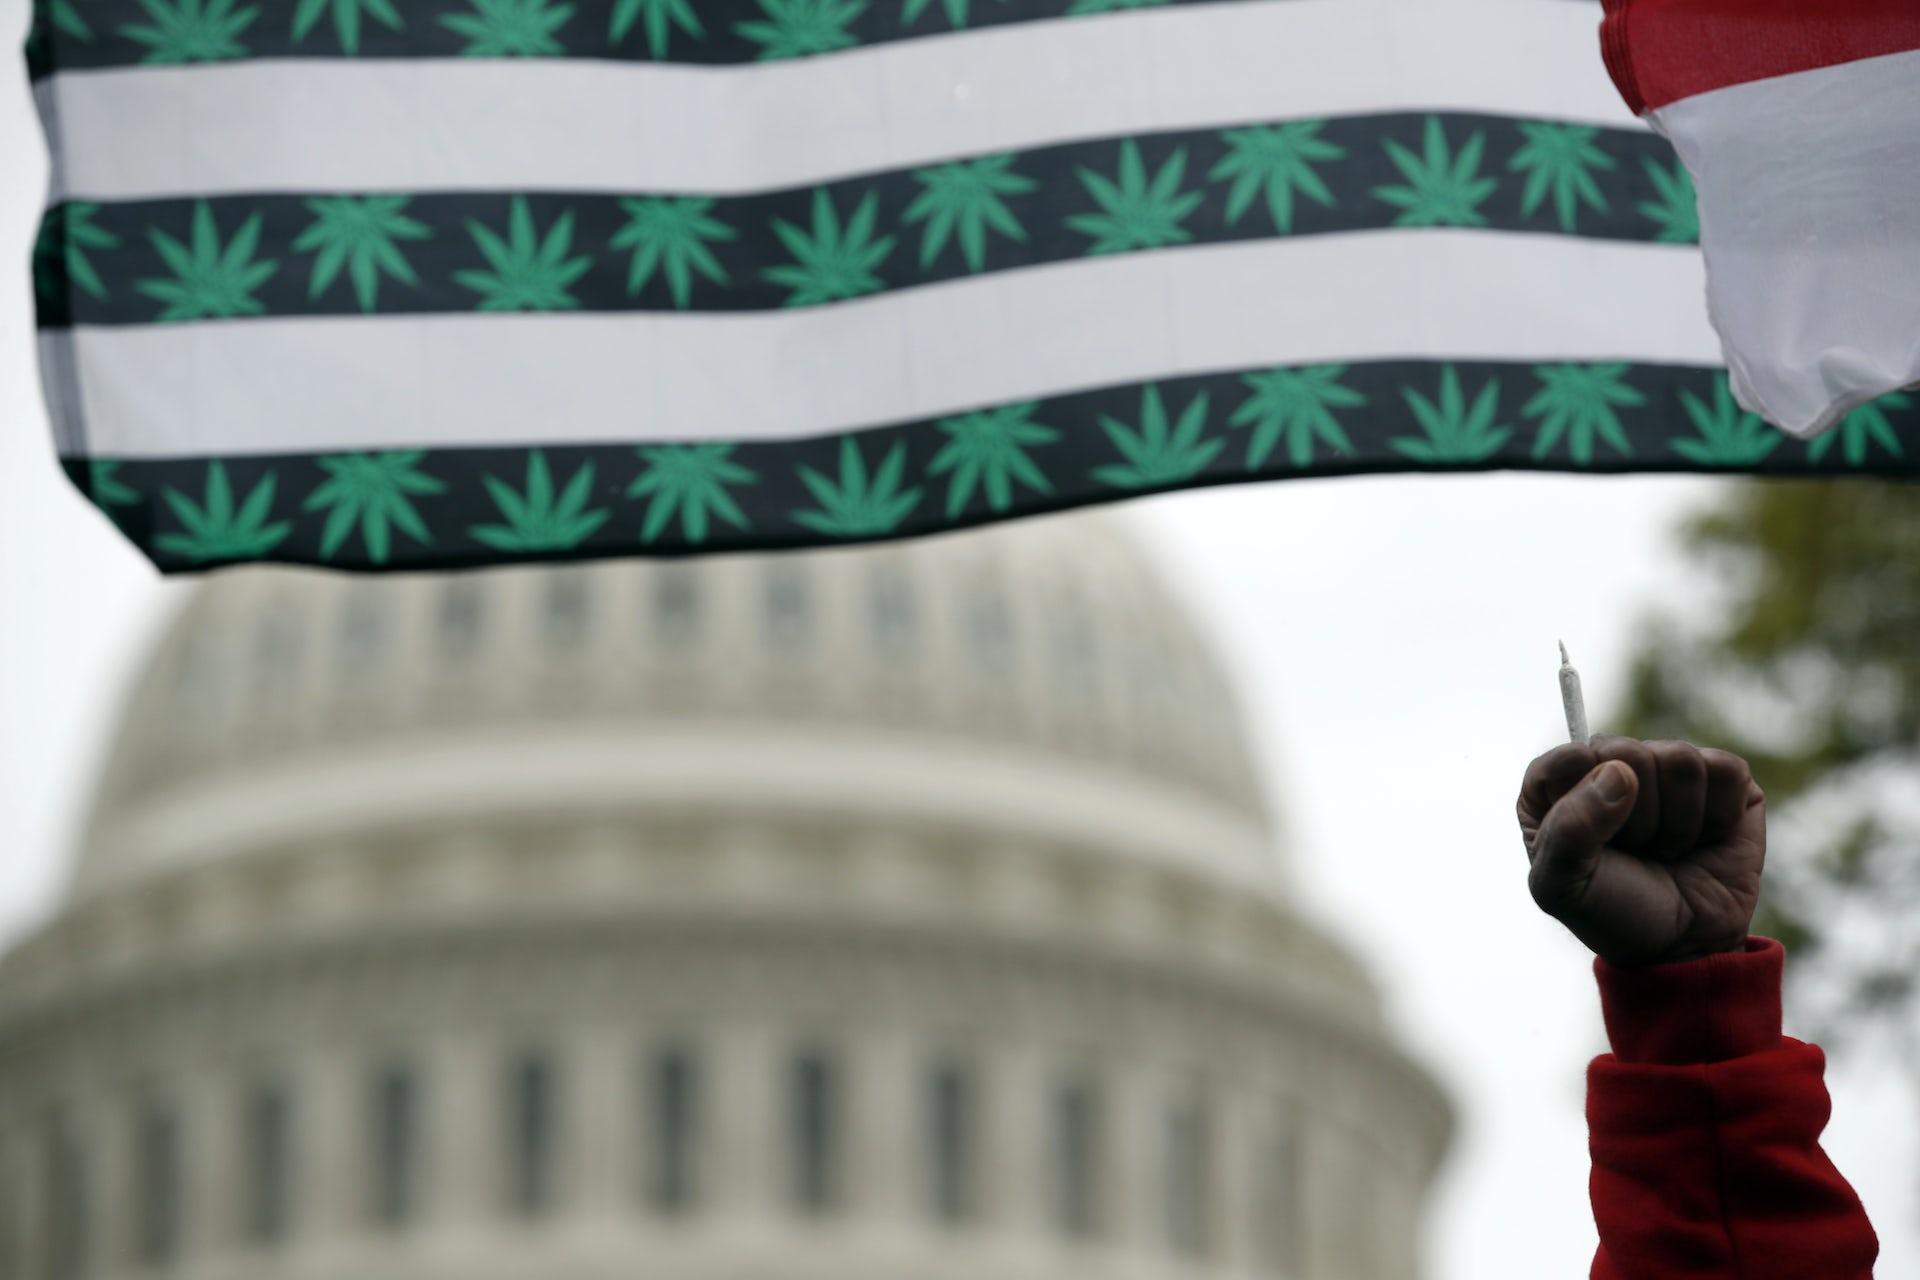 Why do so many Americans now support legalizing marijuana?